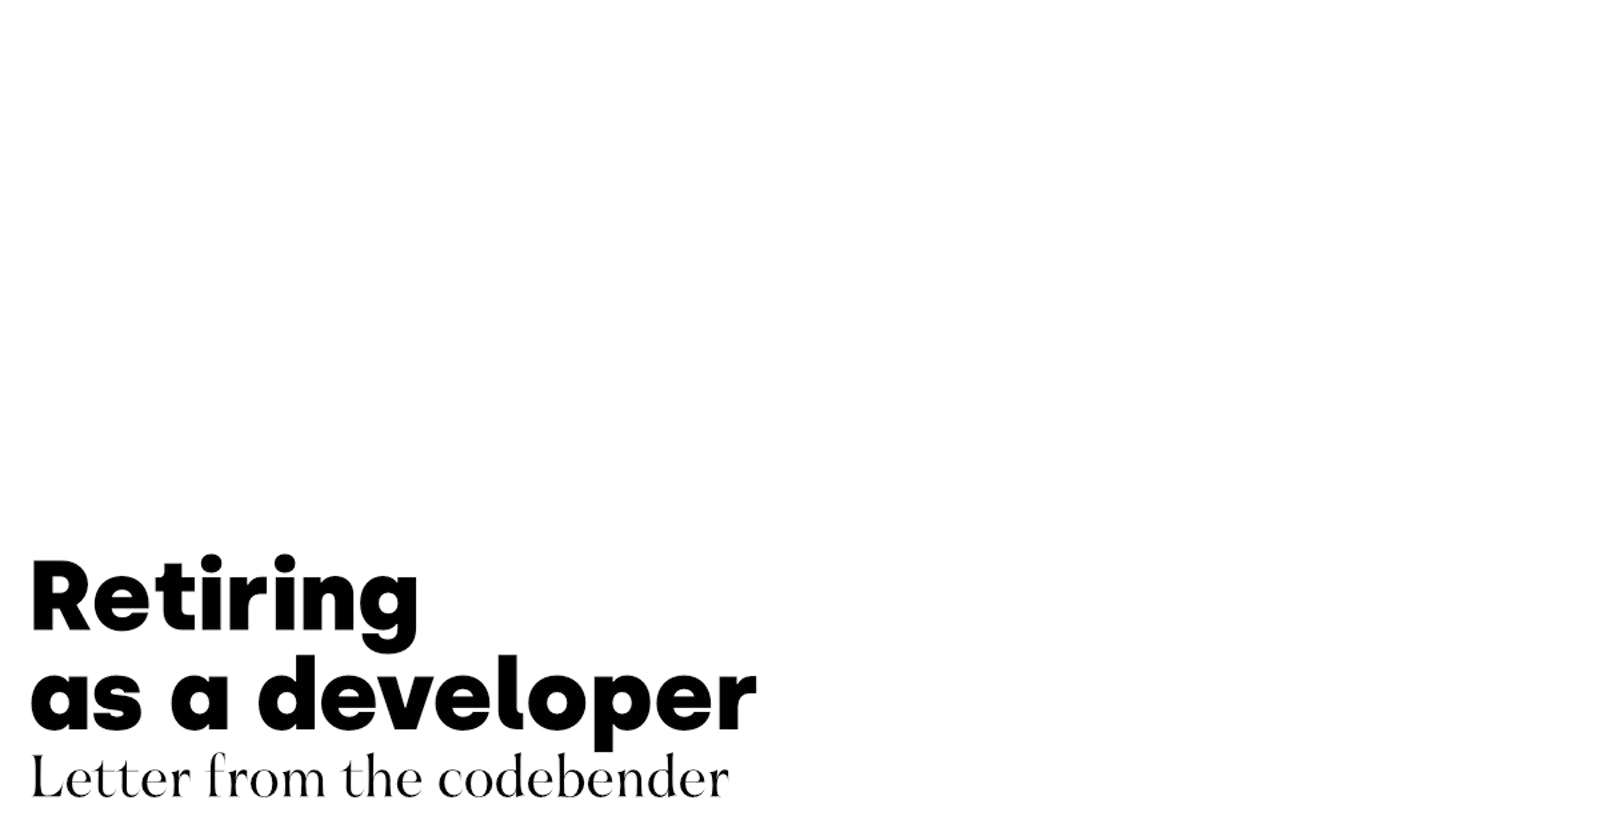 Retiring as a developer